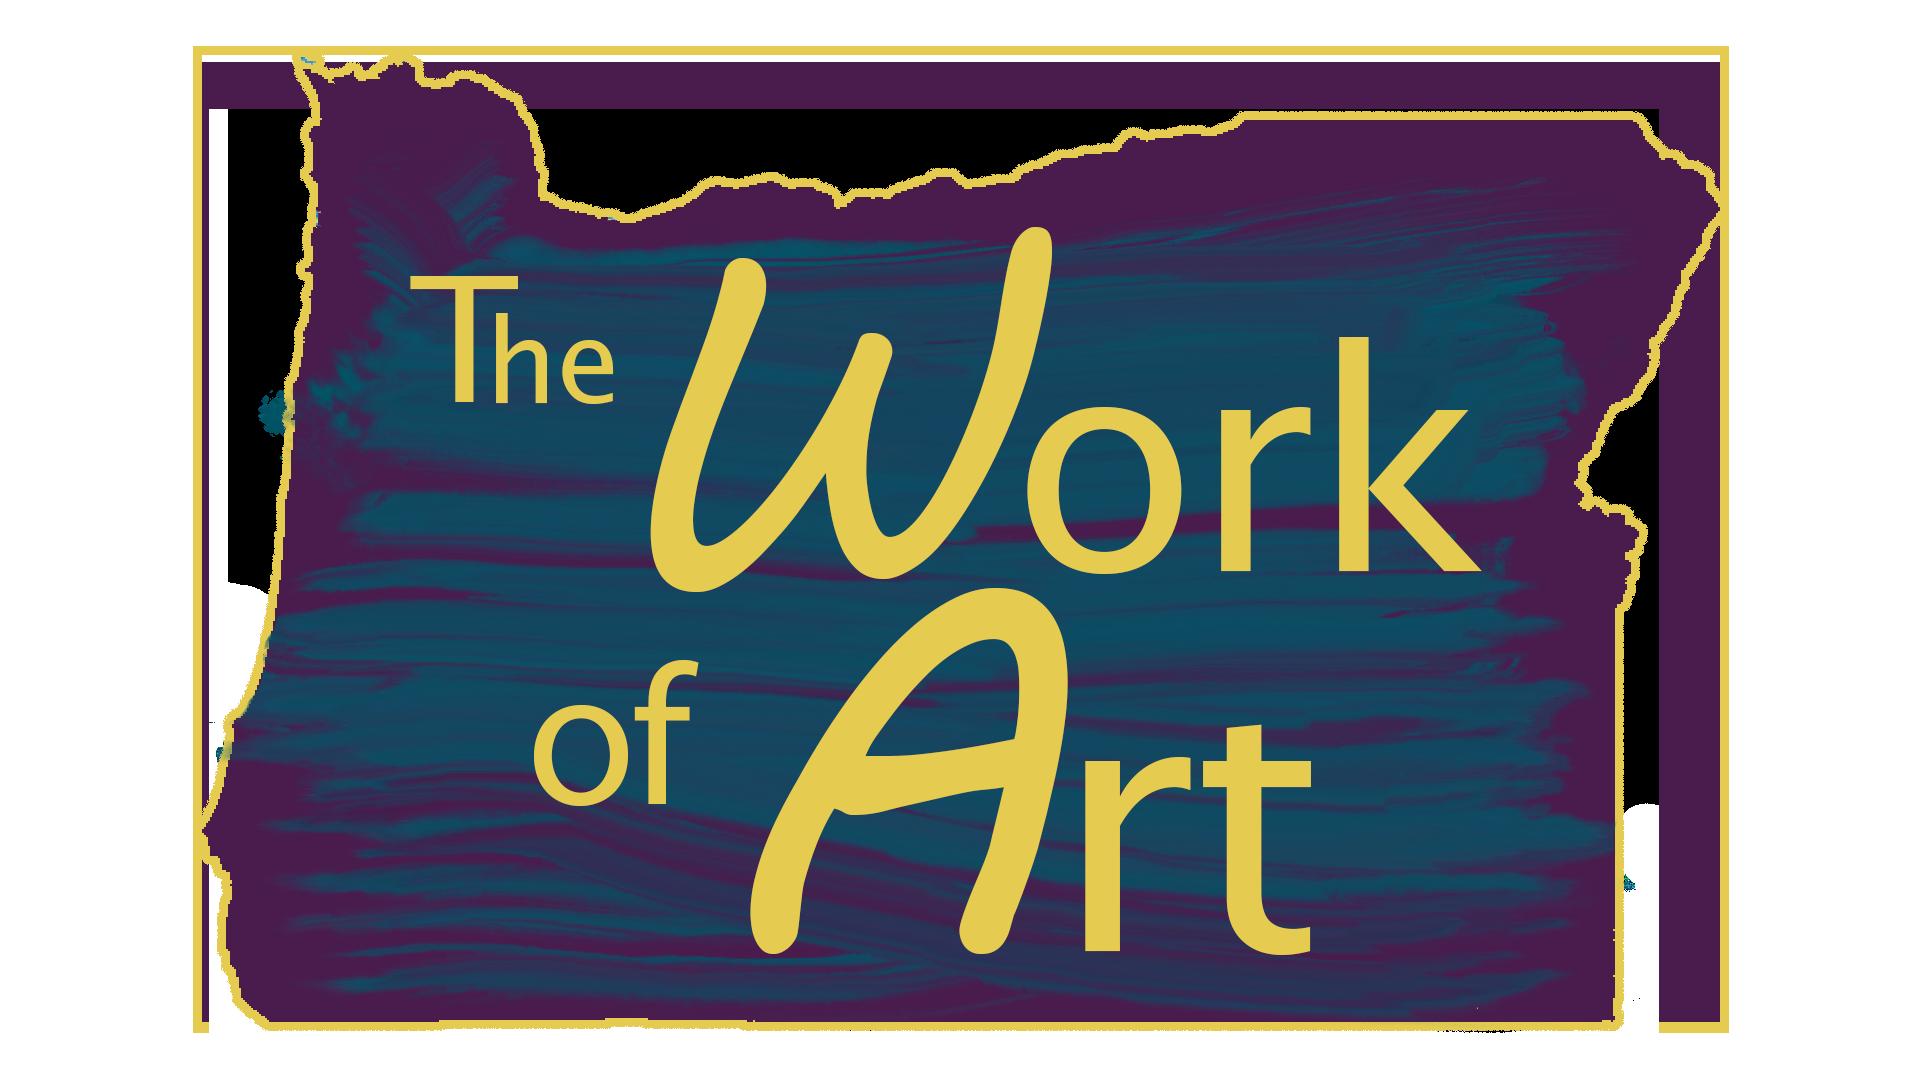 The Work of Art logo